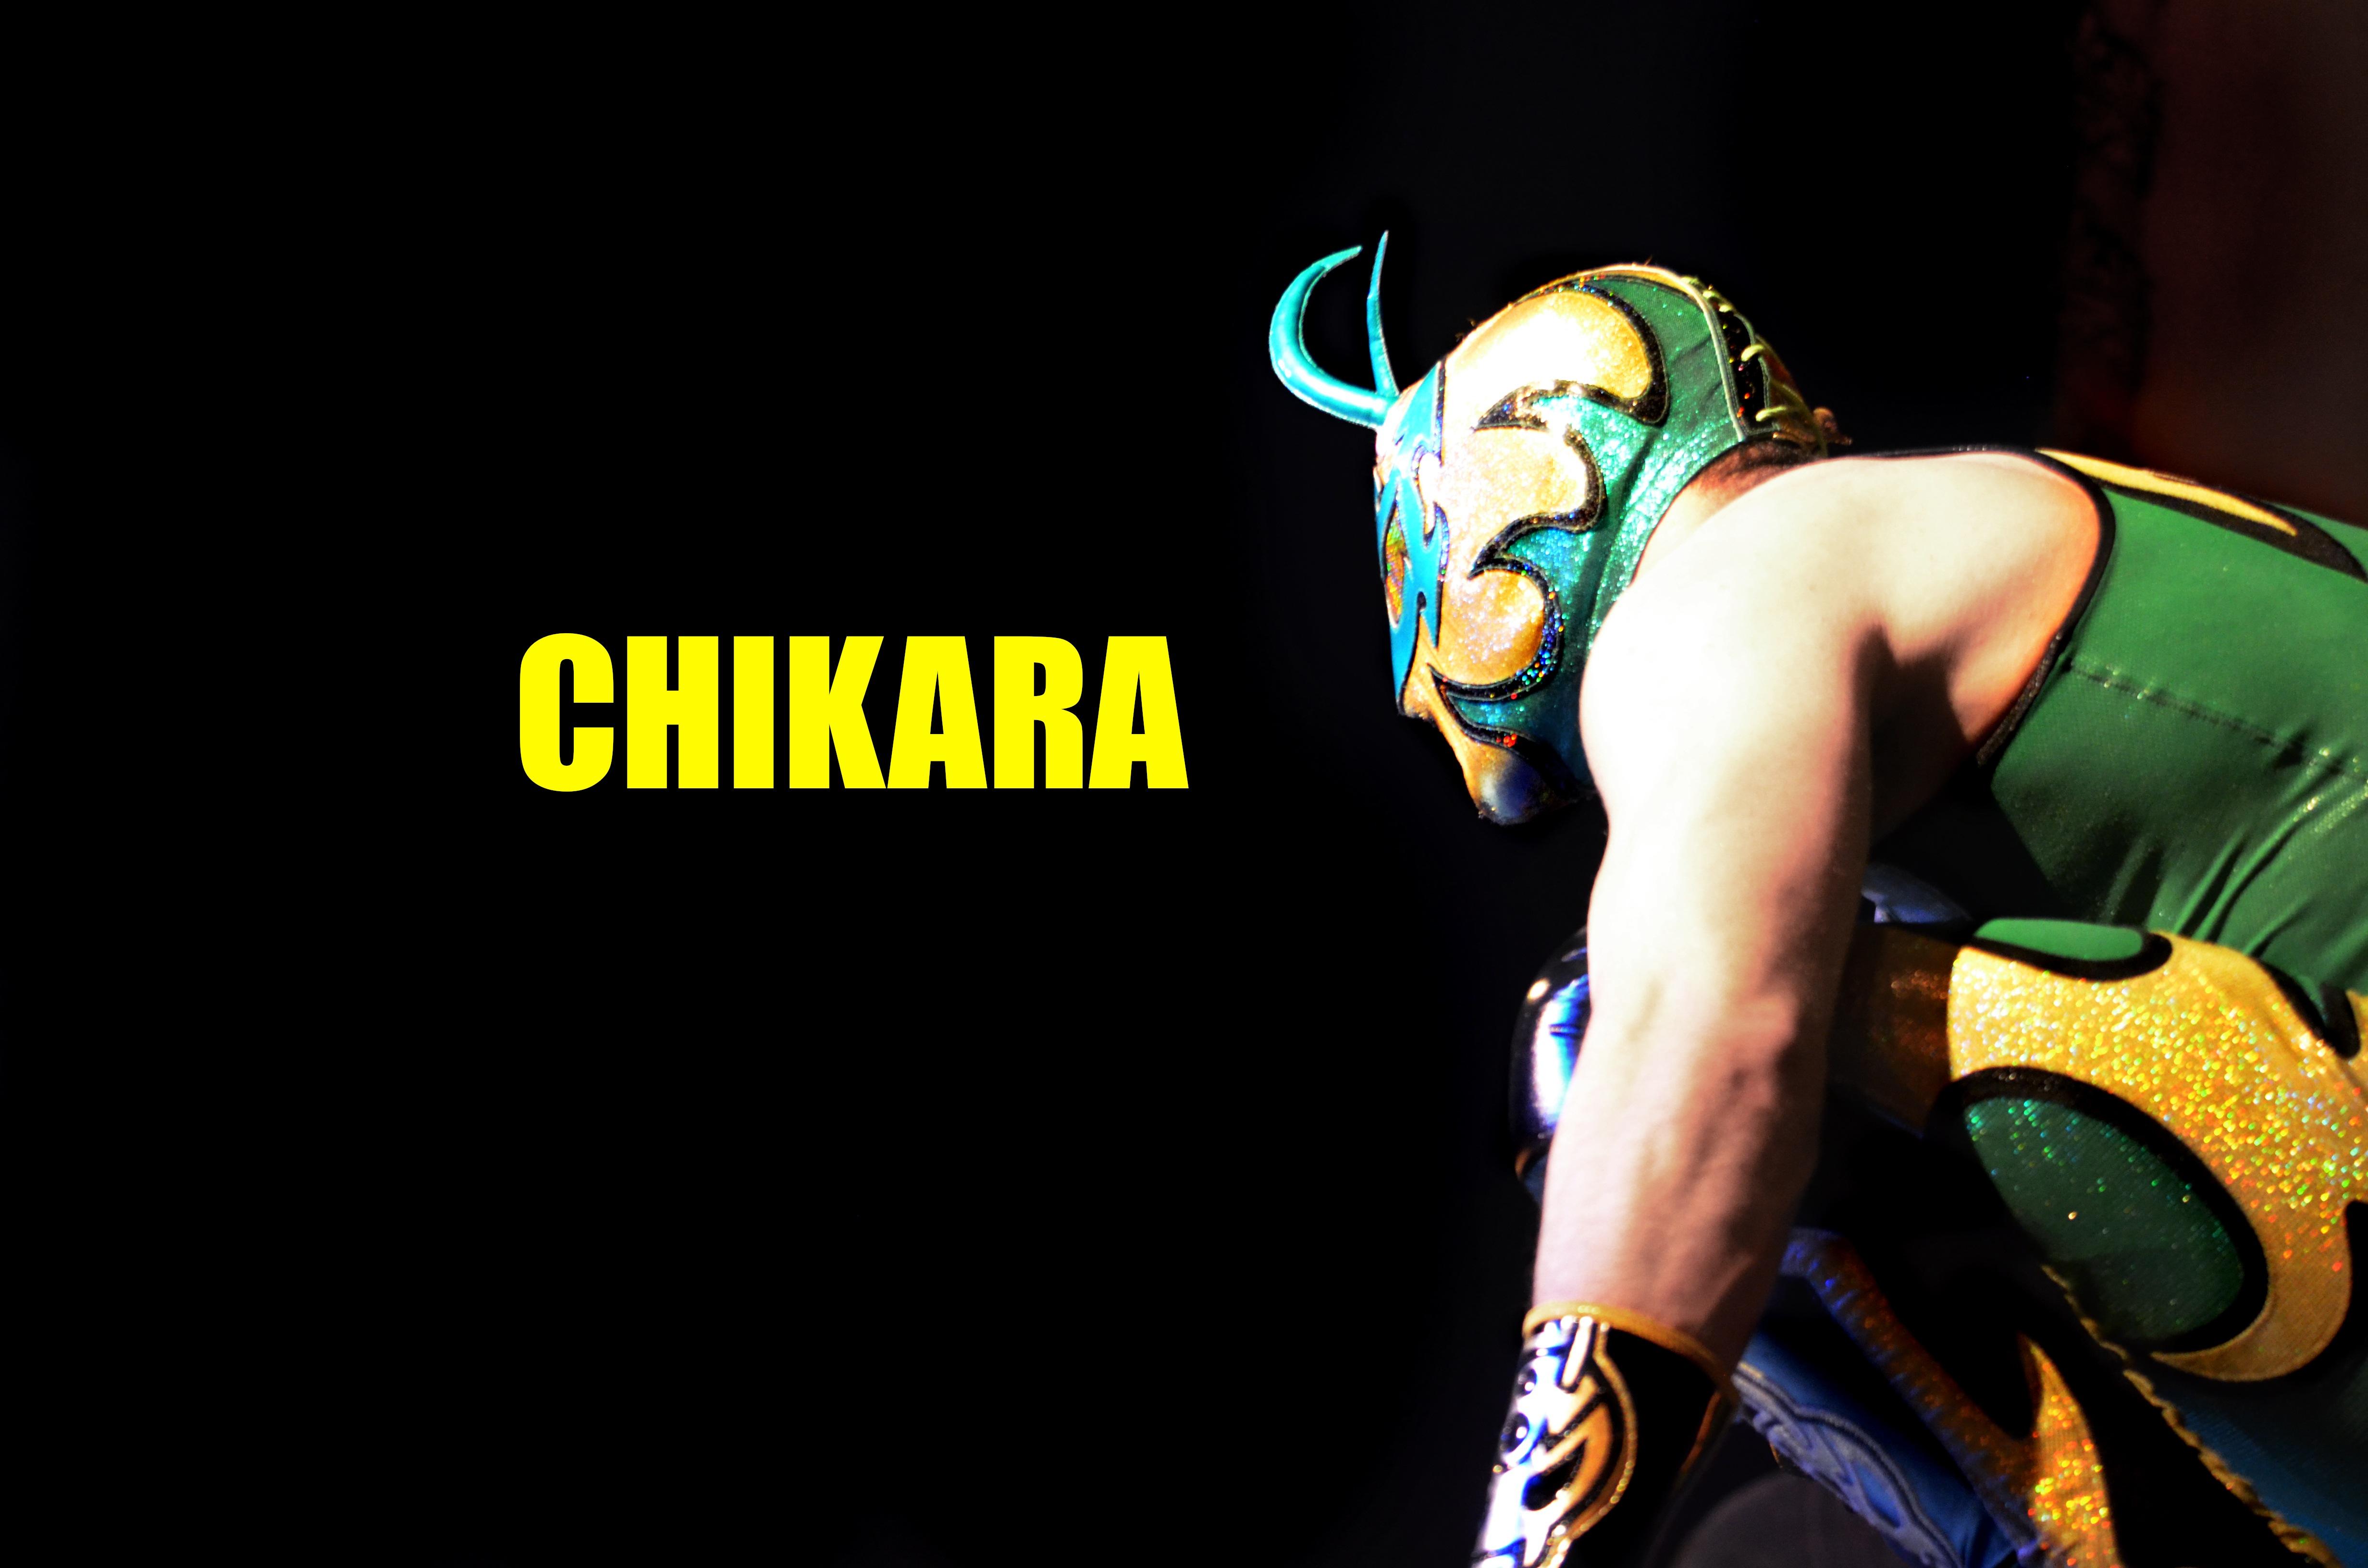 Chikara Cake